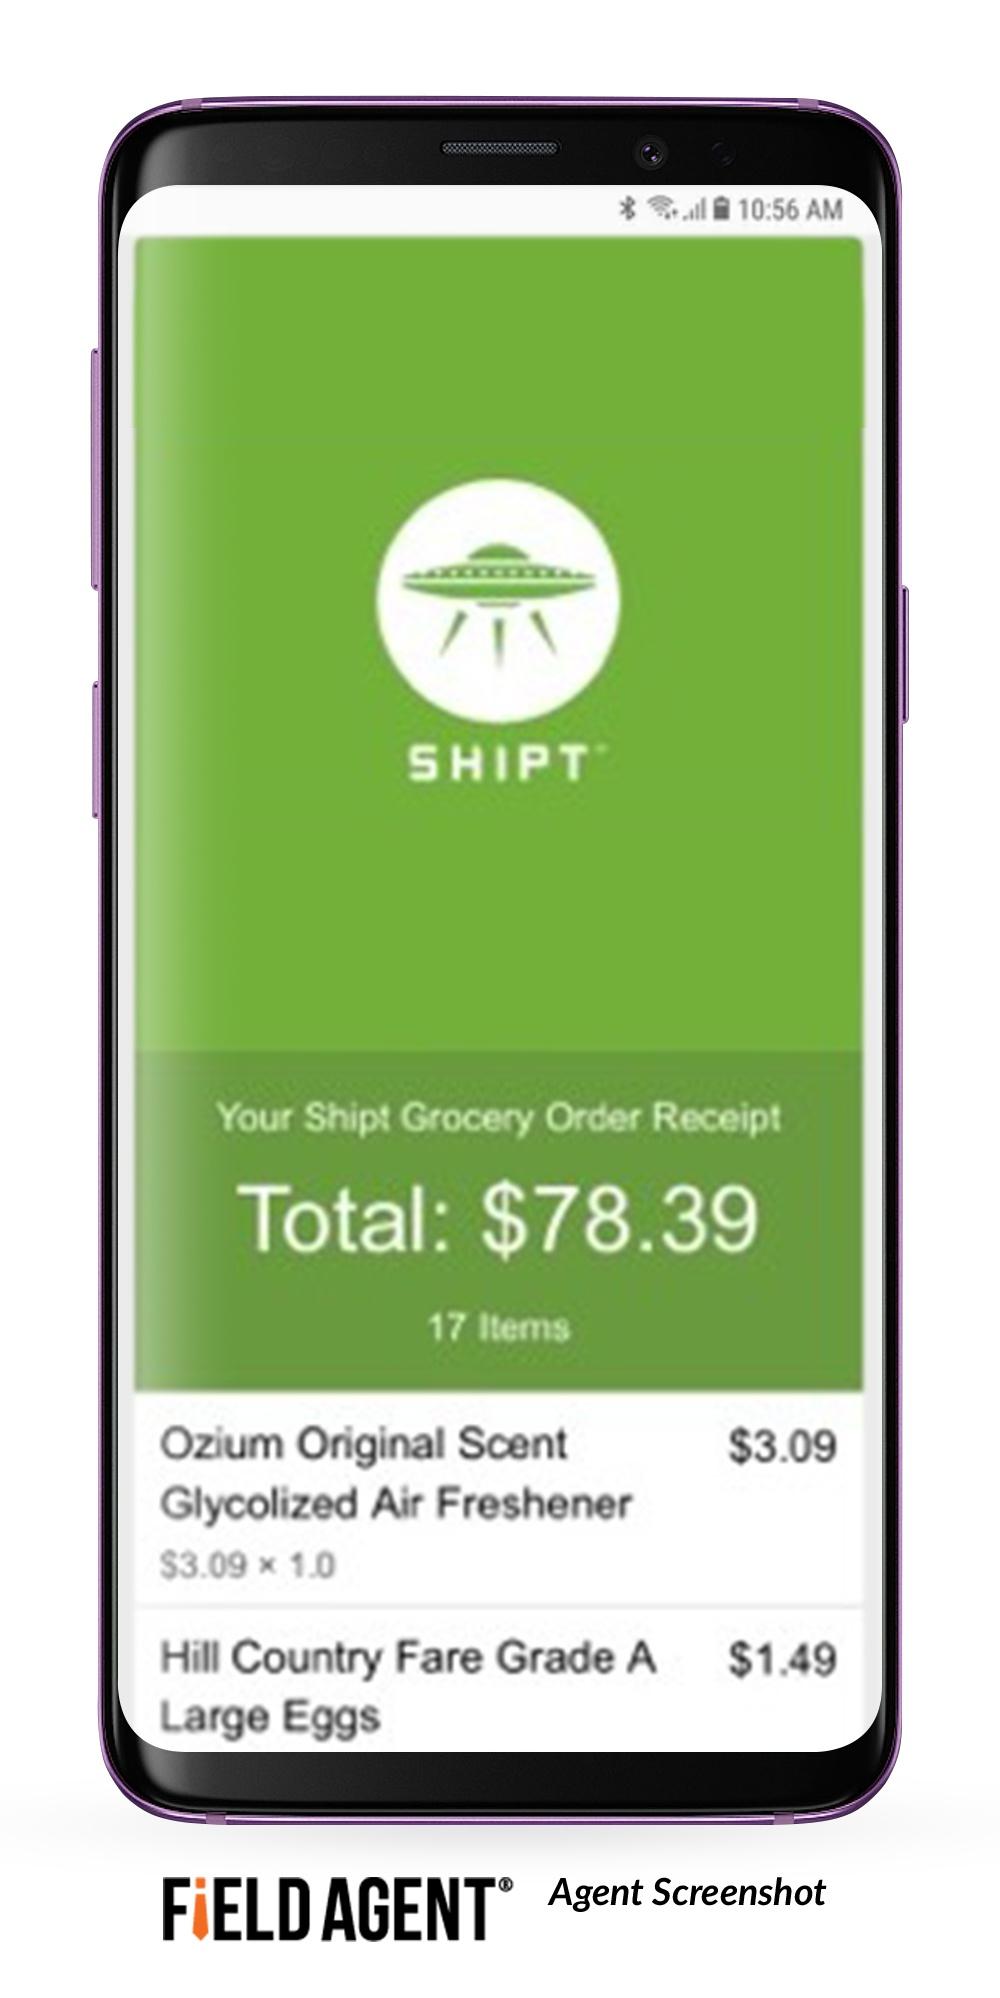 Shipt Order Confirmation